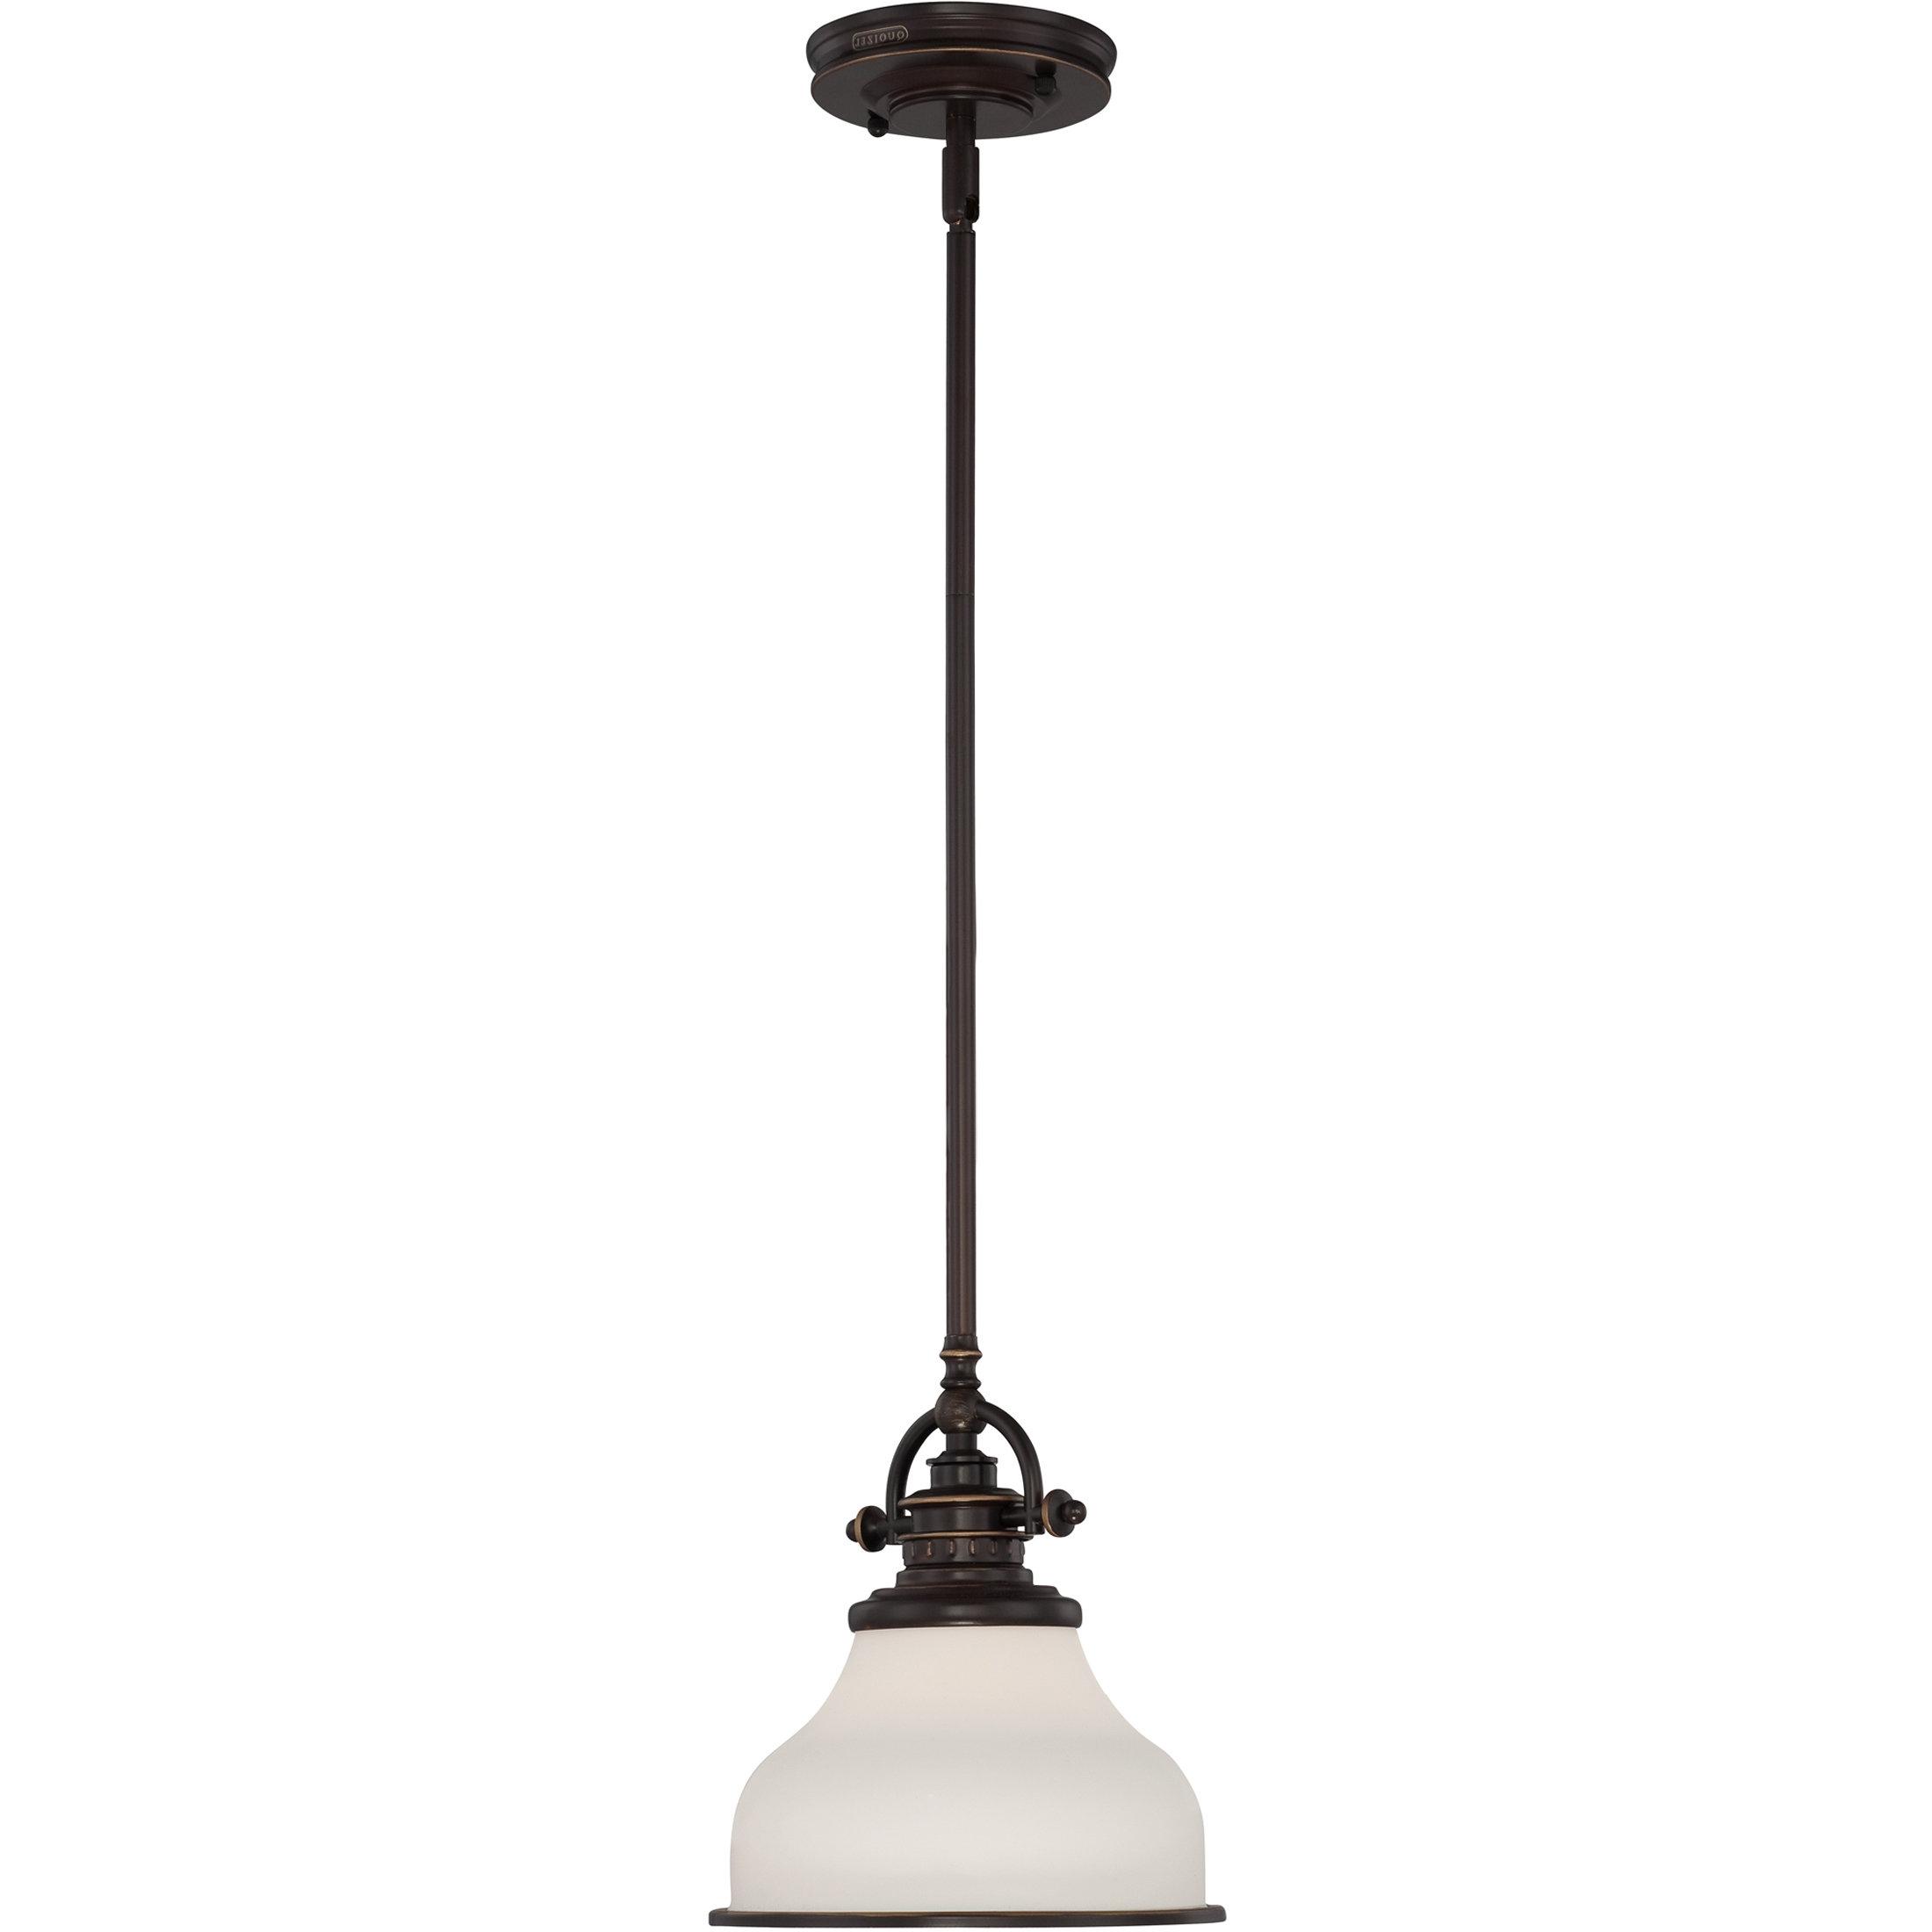 Sussex 1 Light Single Geometric Pendants Pertaining To Famous Macon 1 Light Single Dome Pendant (Gallery 20 of 20)